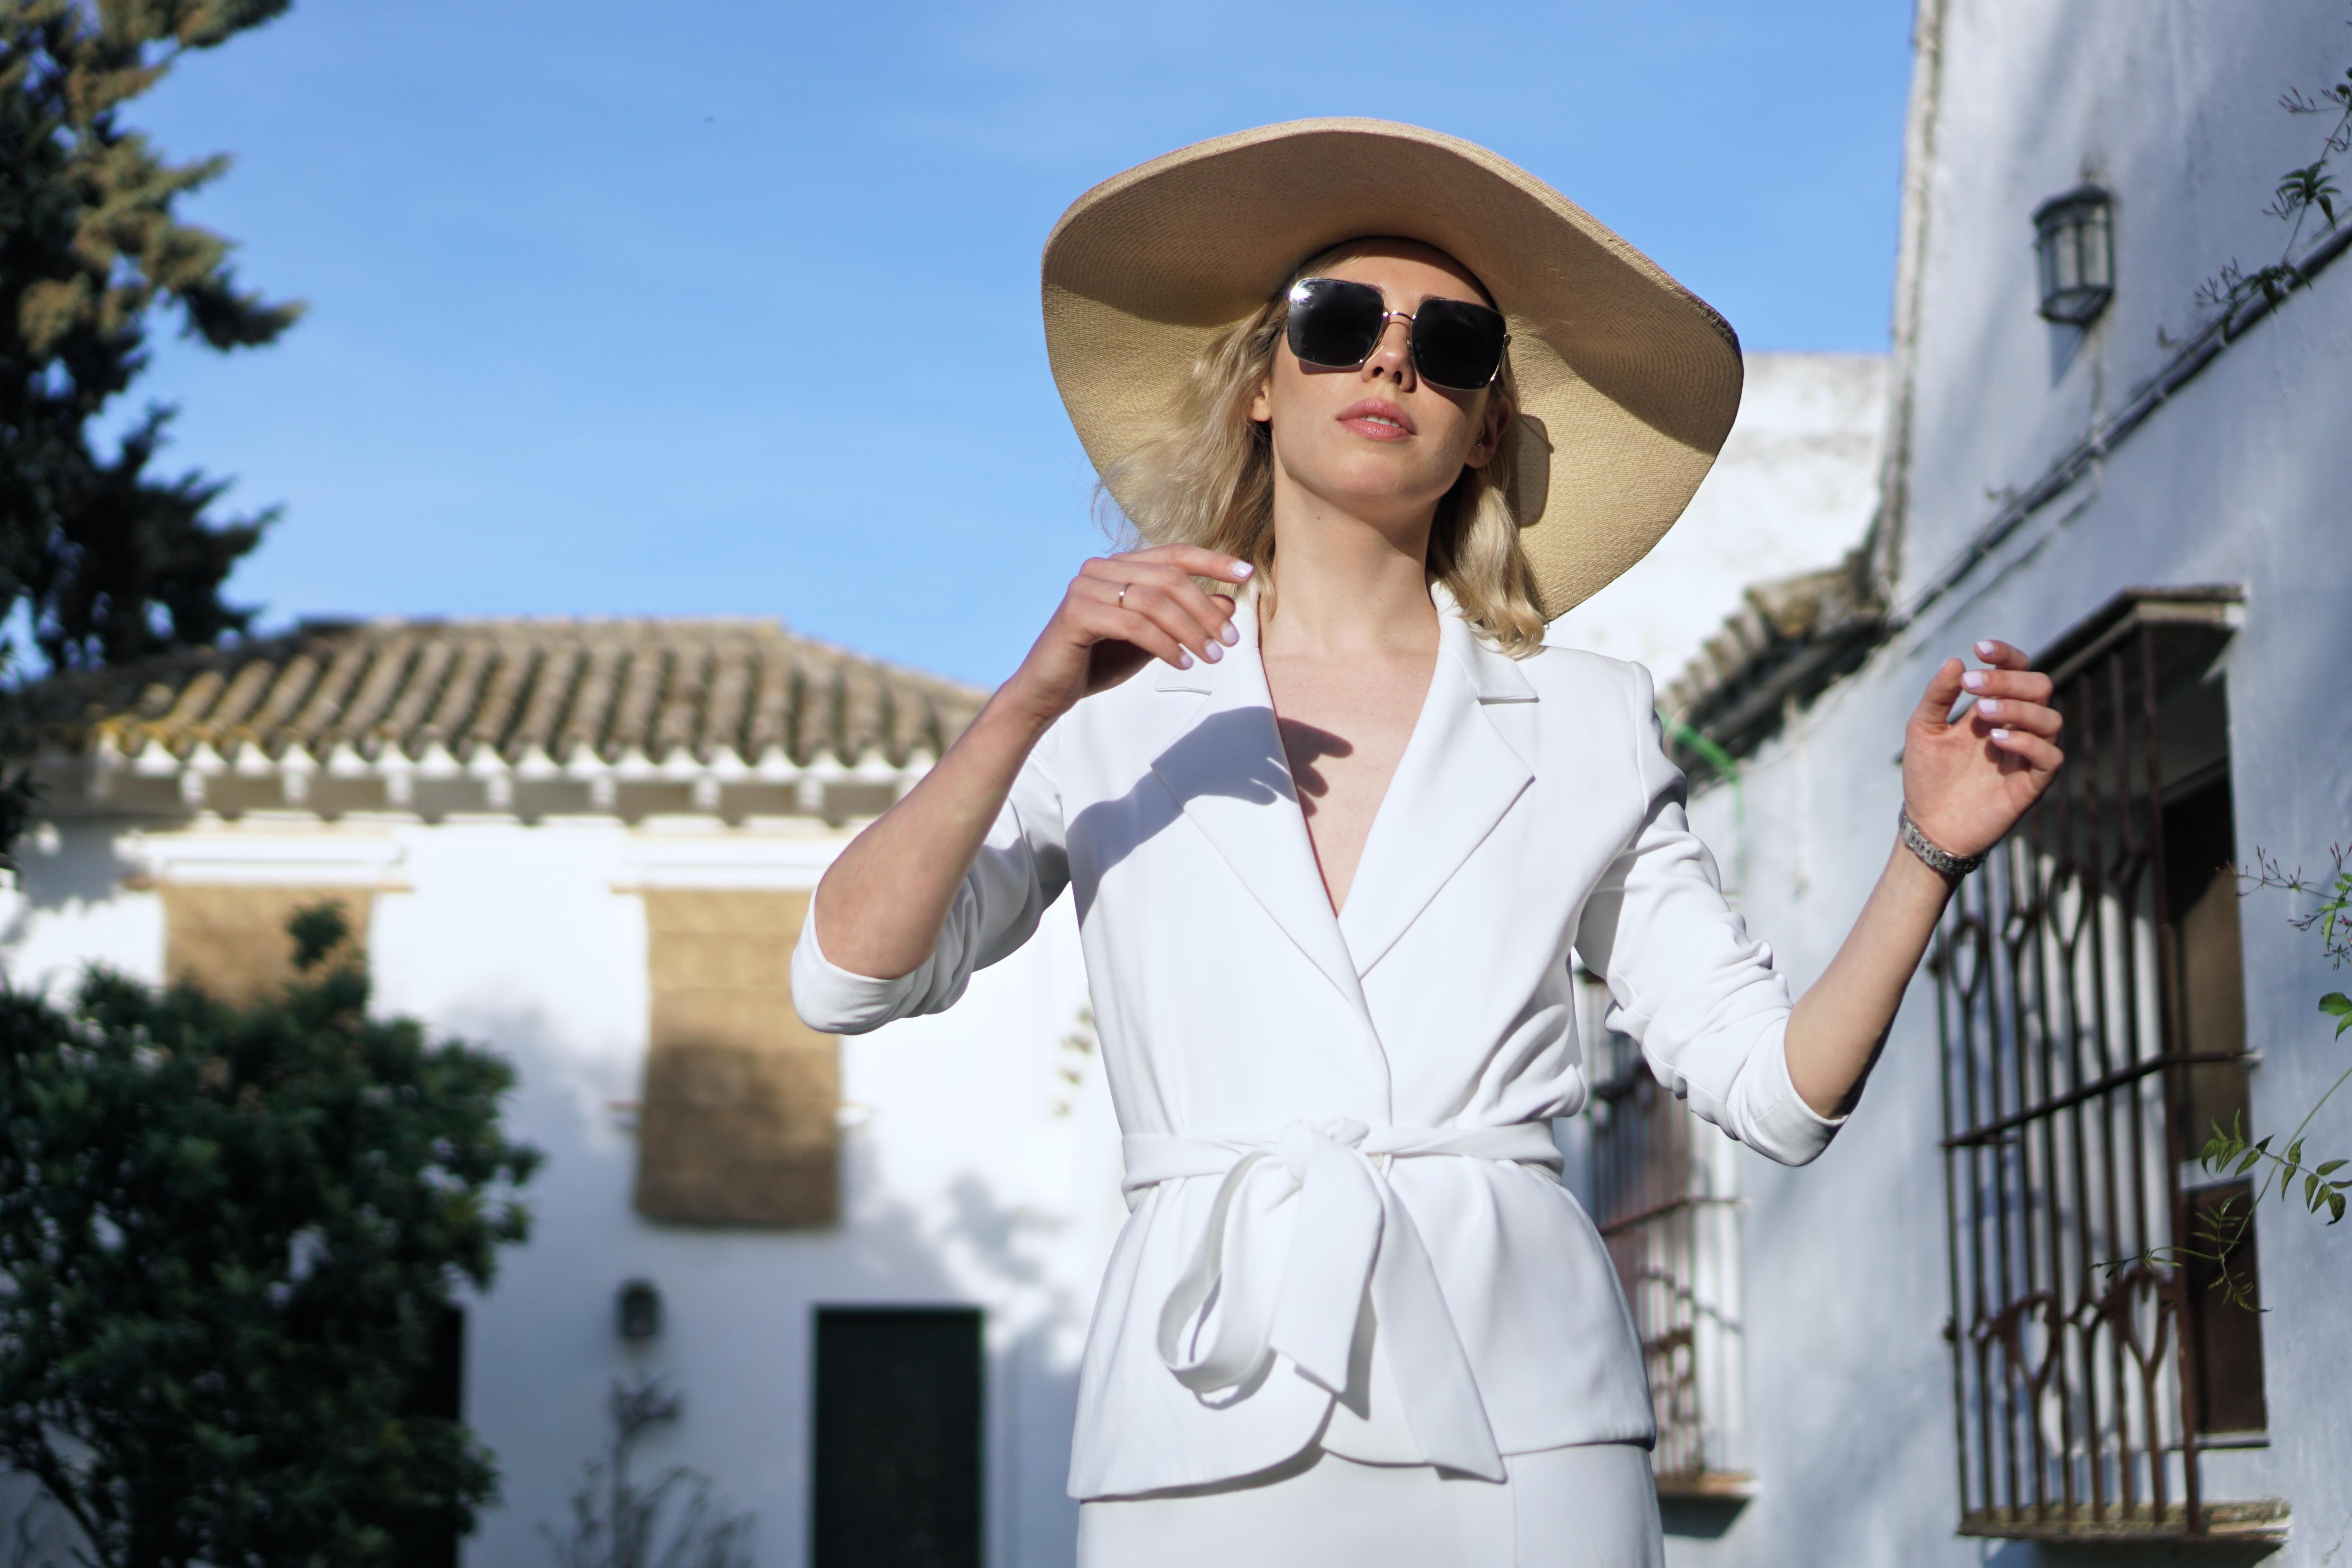 The white suit-4417-lulufigueroa